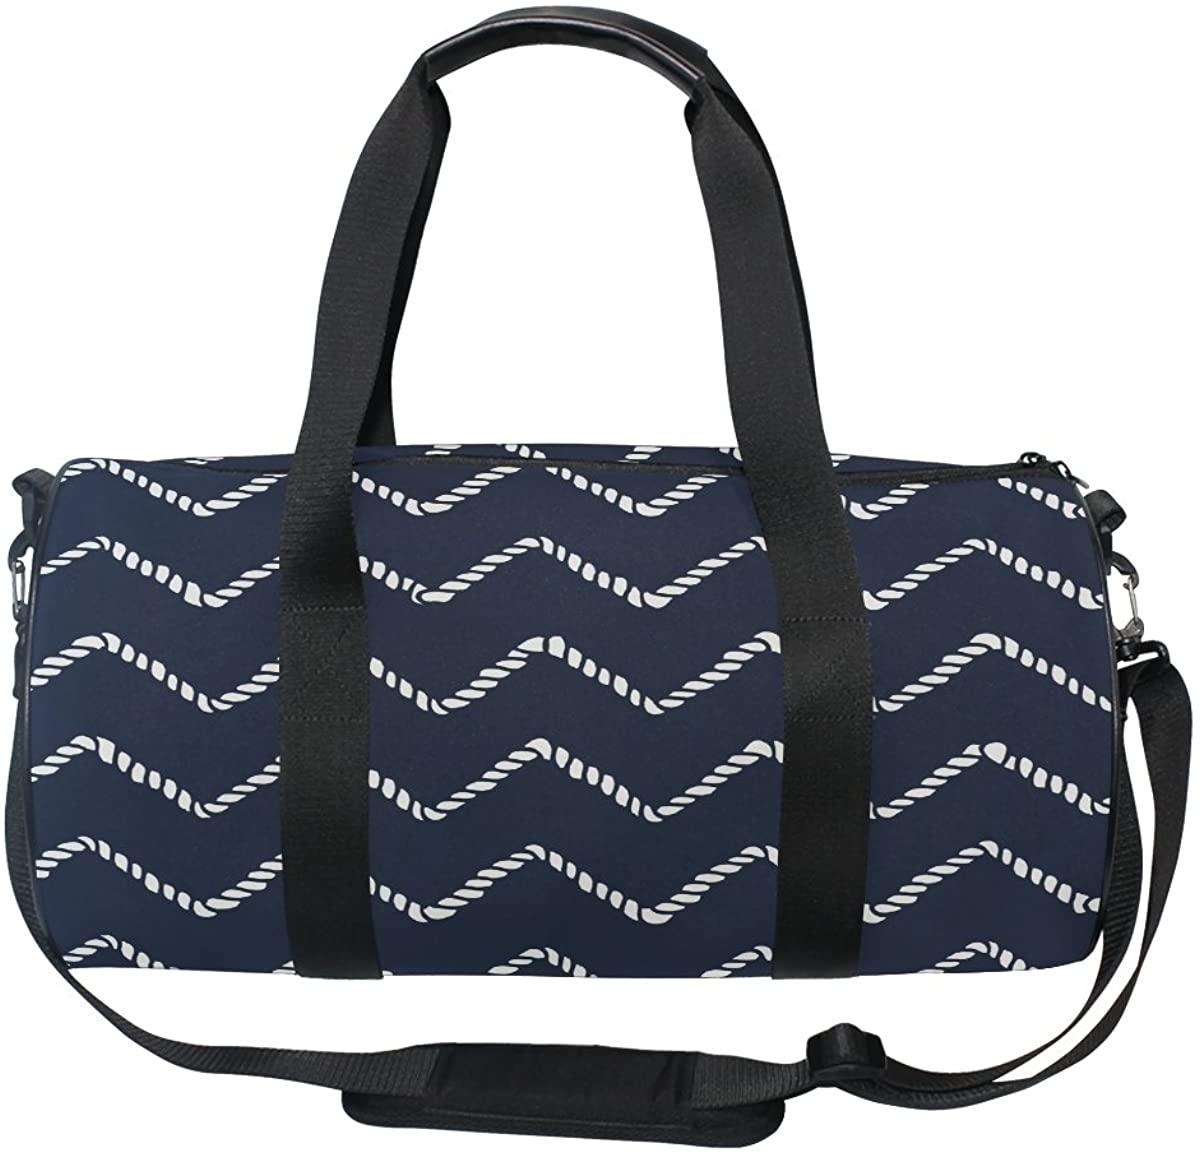 ALAZA Navy Marine Rope Chevron Sports Gym Duffel Bag Travel Luggage Handbag for Men Women